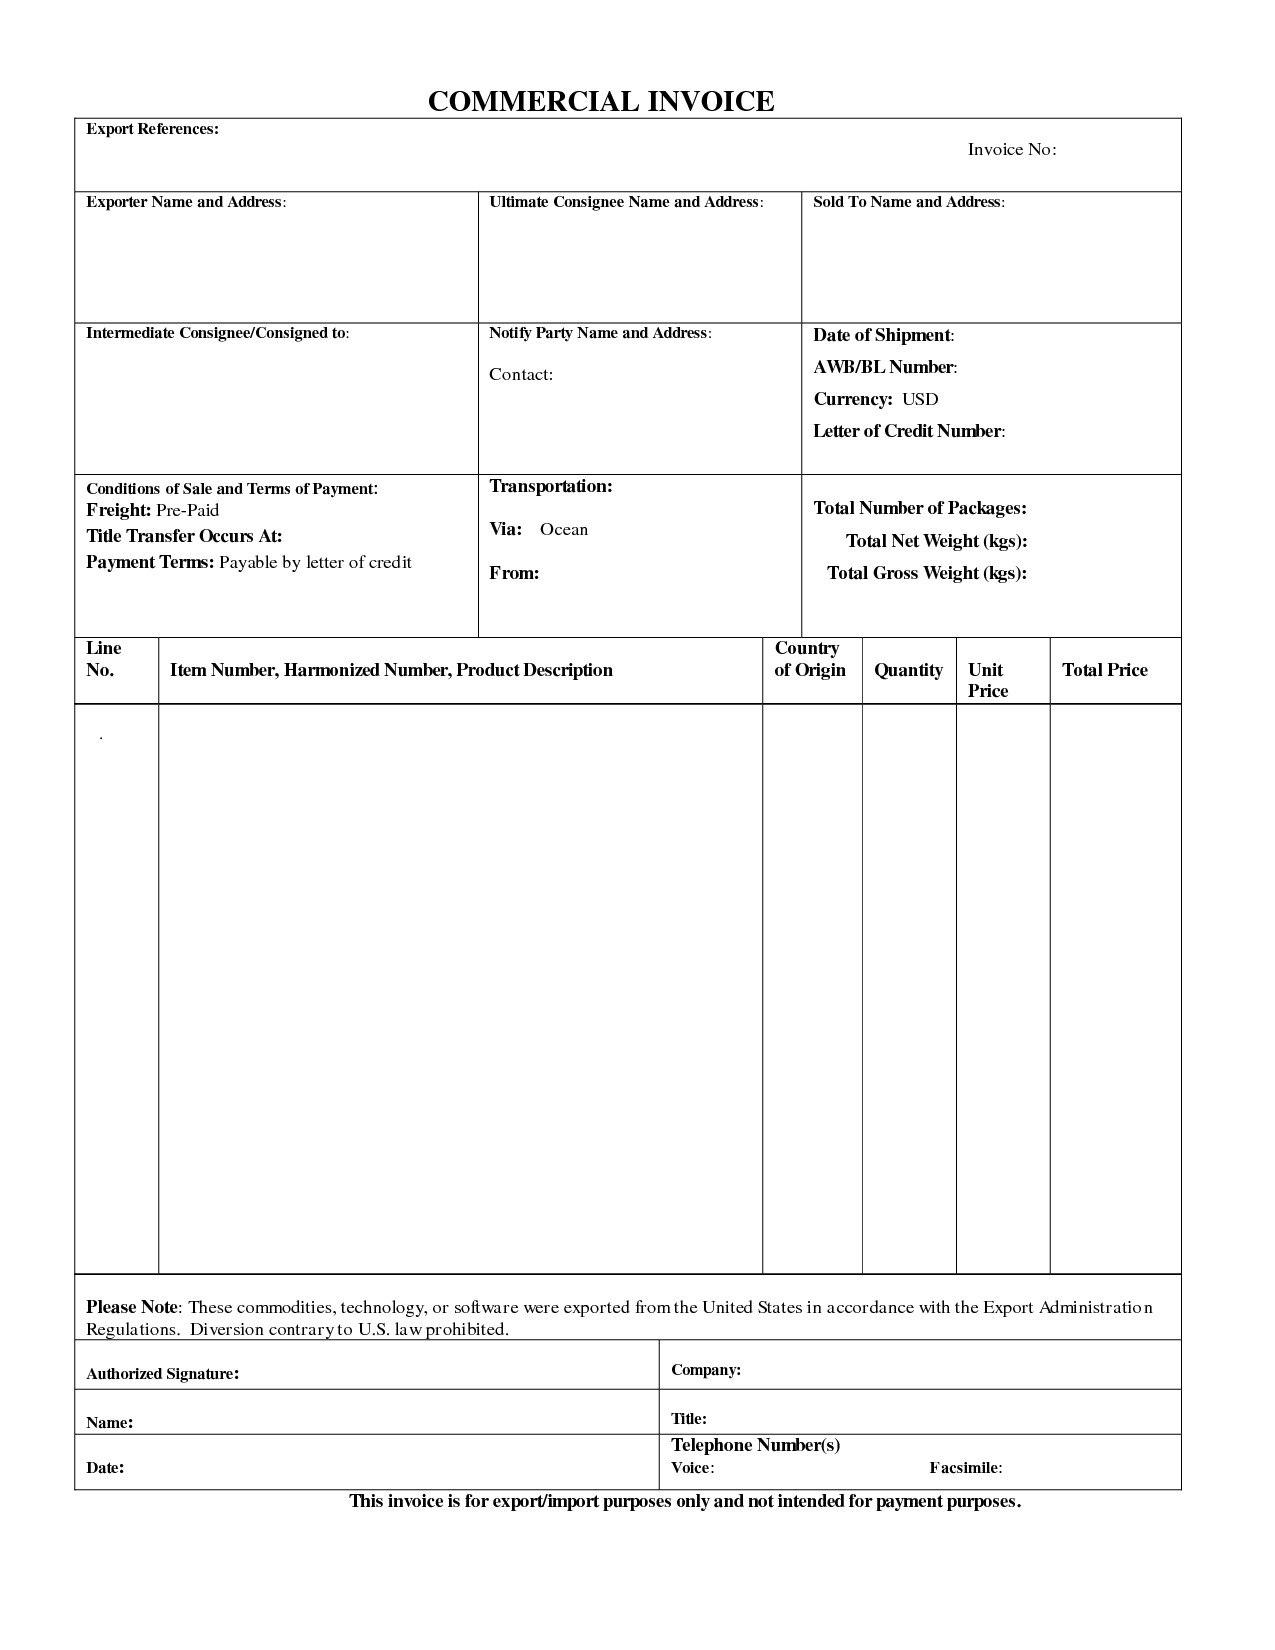 Export Invoice Template Quickbooks Für Export Proforma Invoice Pinar With Regard To Export Invoice Template Quickbooks